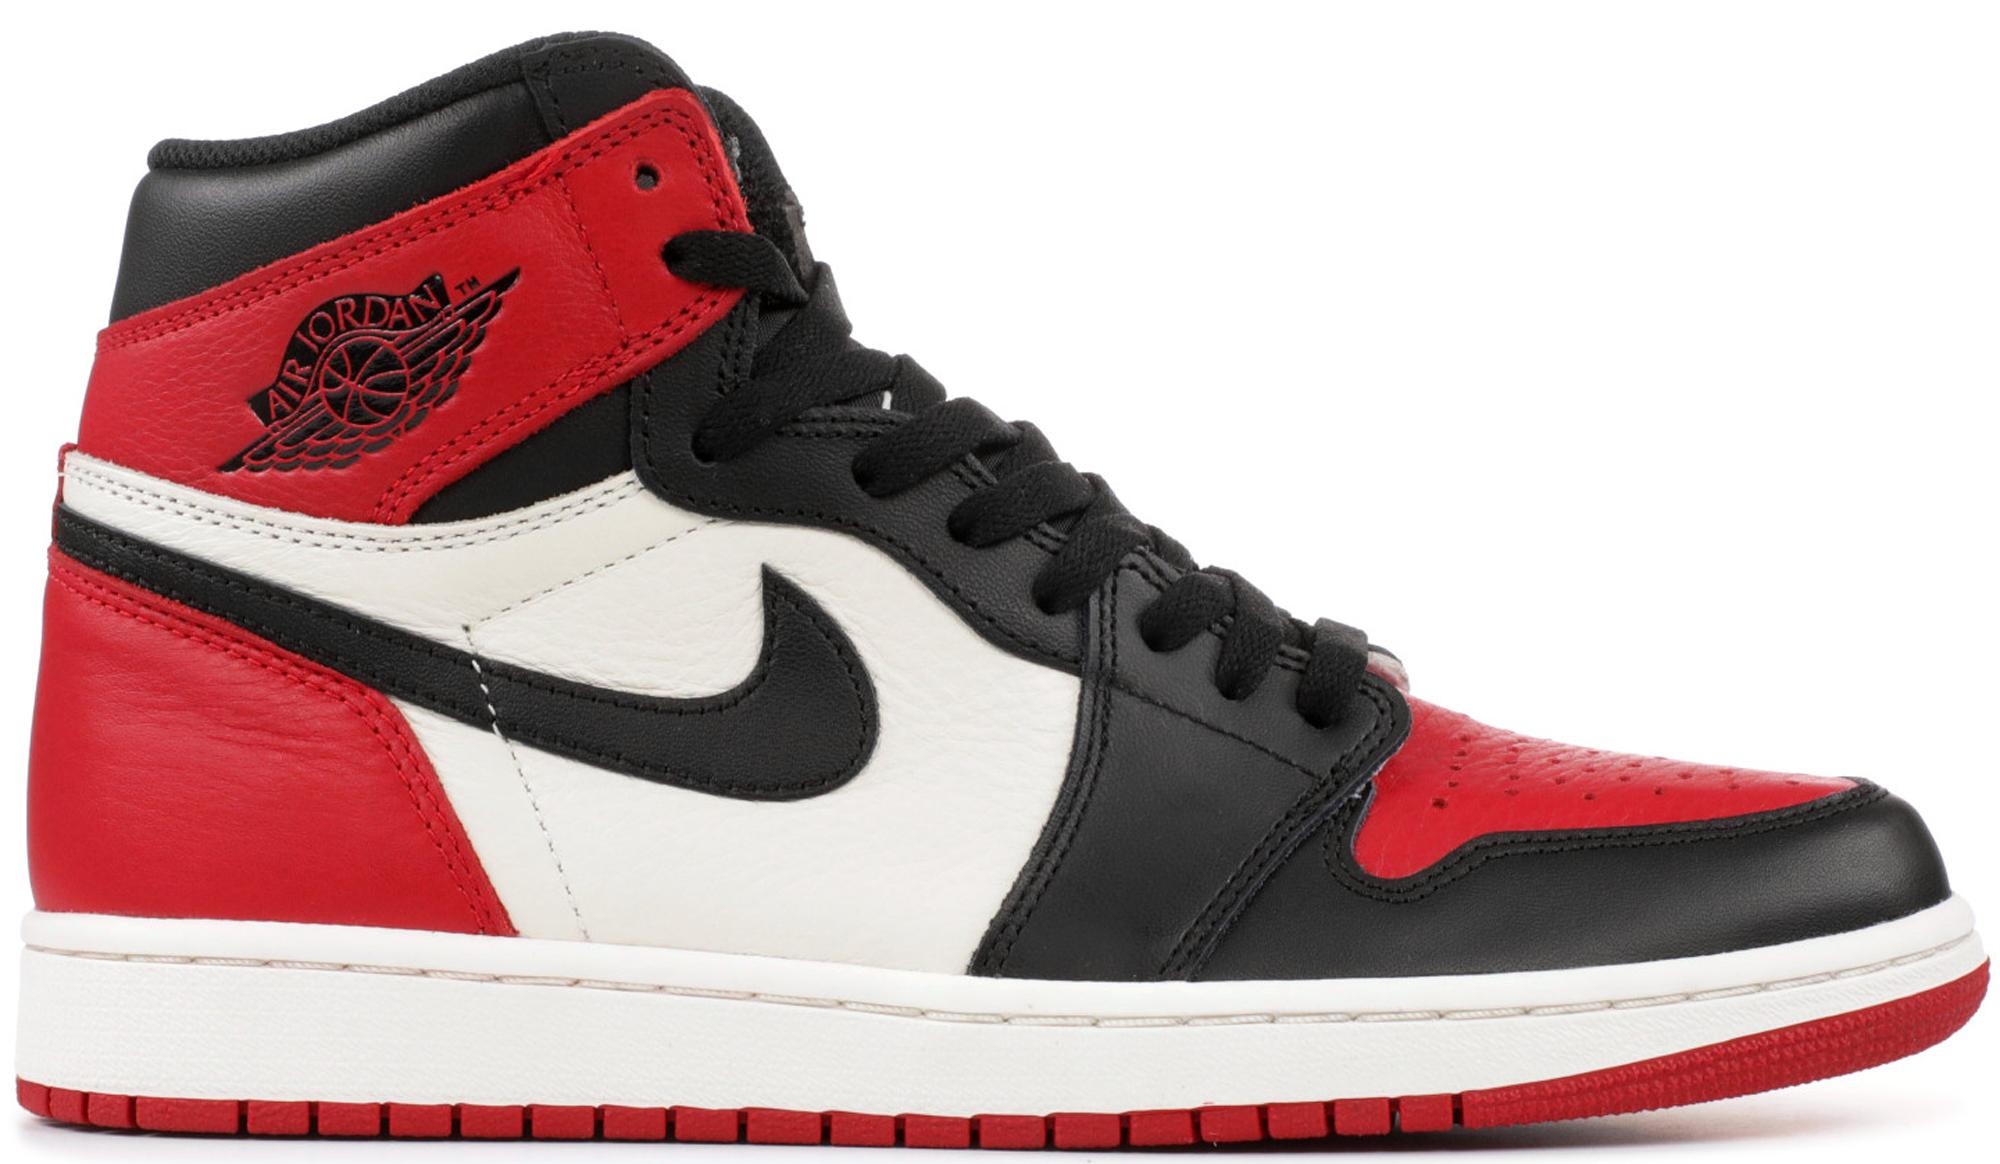 air jordan 1 retro high og bred toe stock x shoes